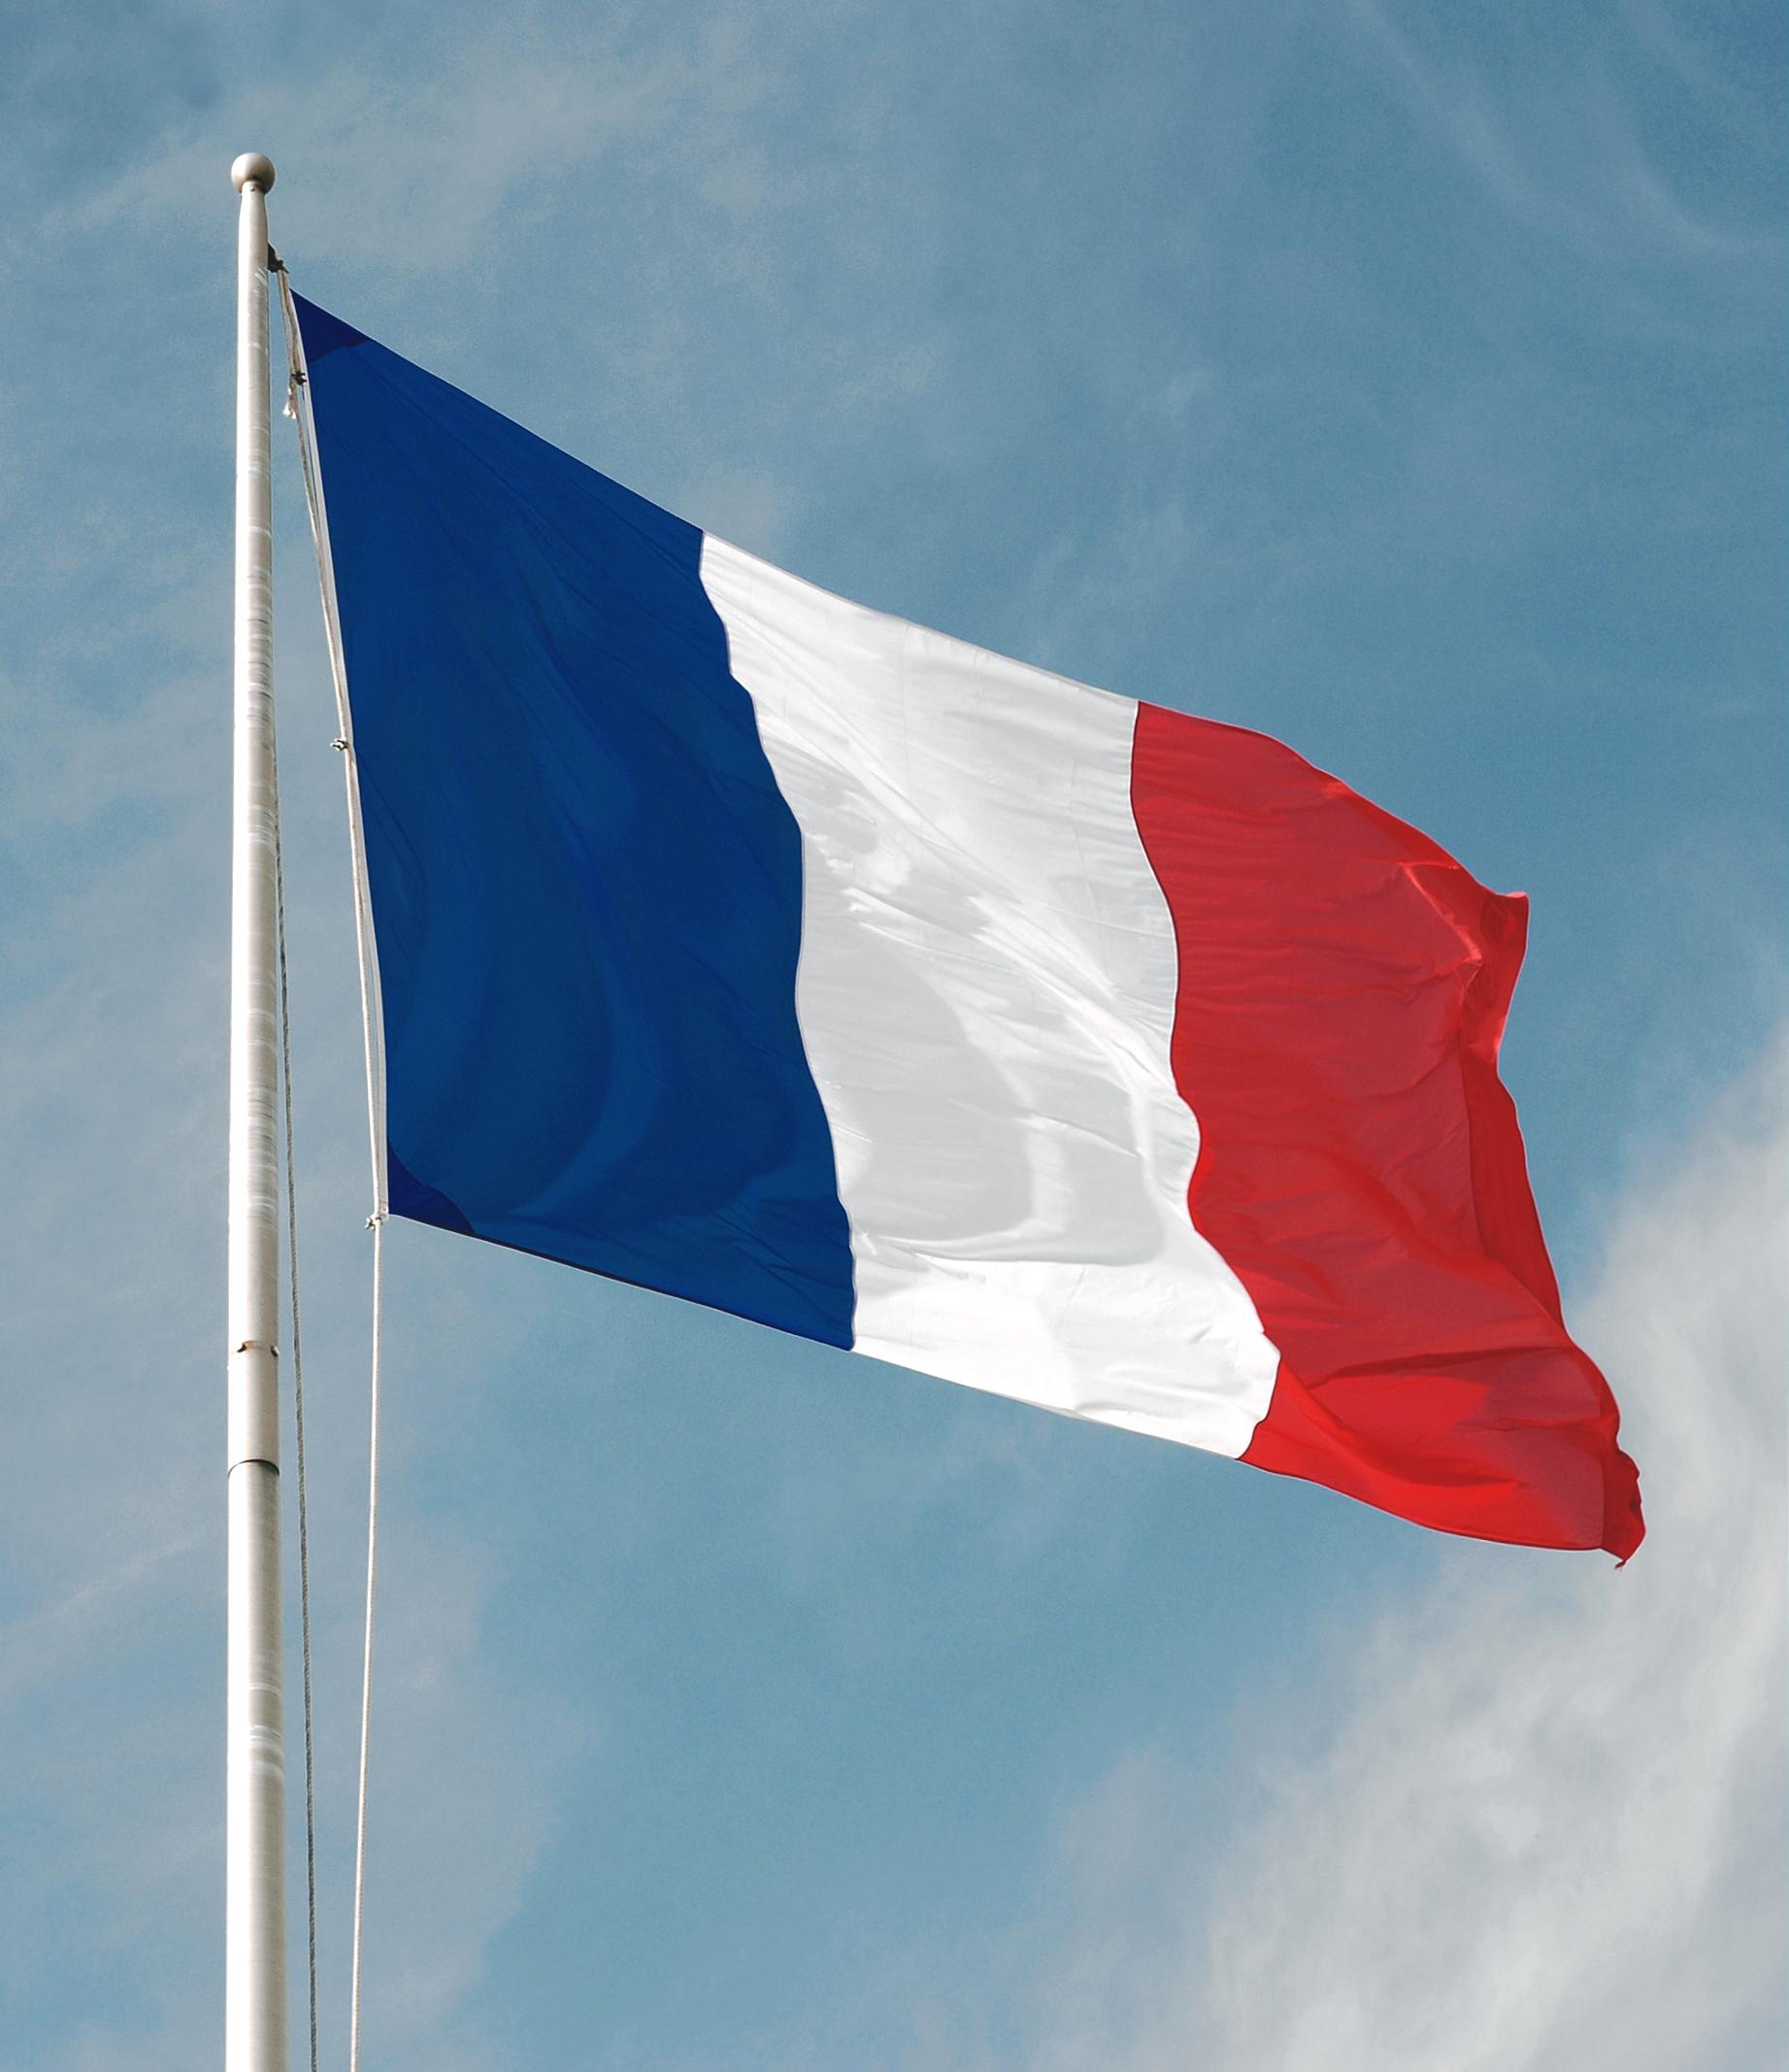 http://upload.wikimedia.org/wikipedia/commons/3/3c/Drapeau_fran%C3%A7ais.PNG